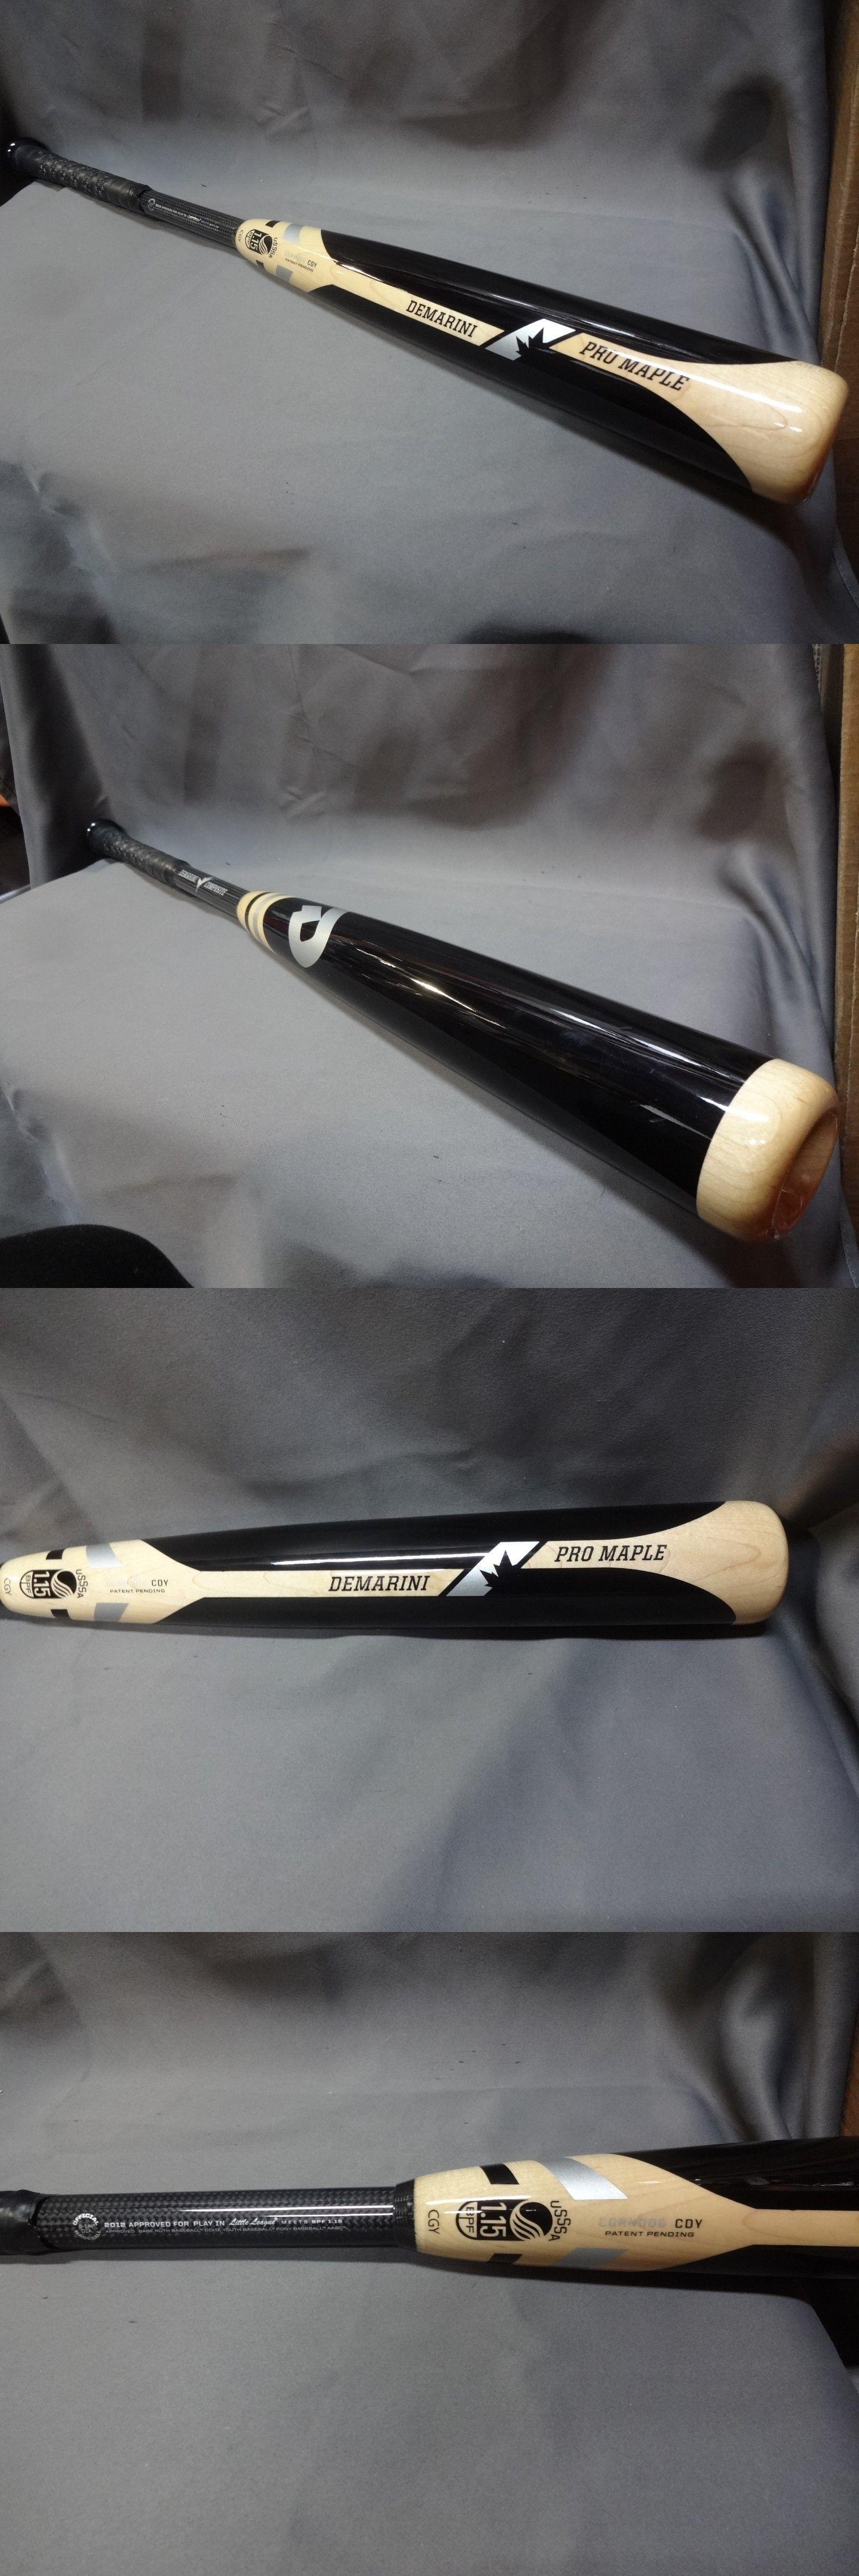 Baseball-Youth 73897: Demarini Youth Wood Composite Baseball